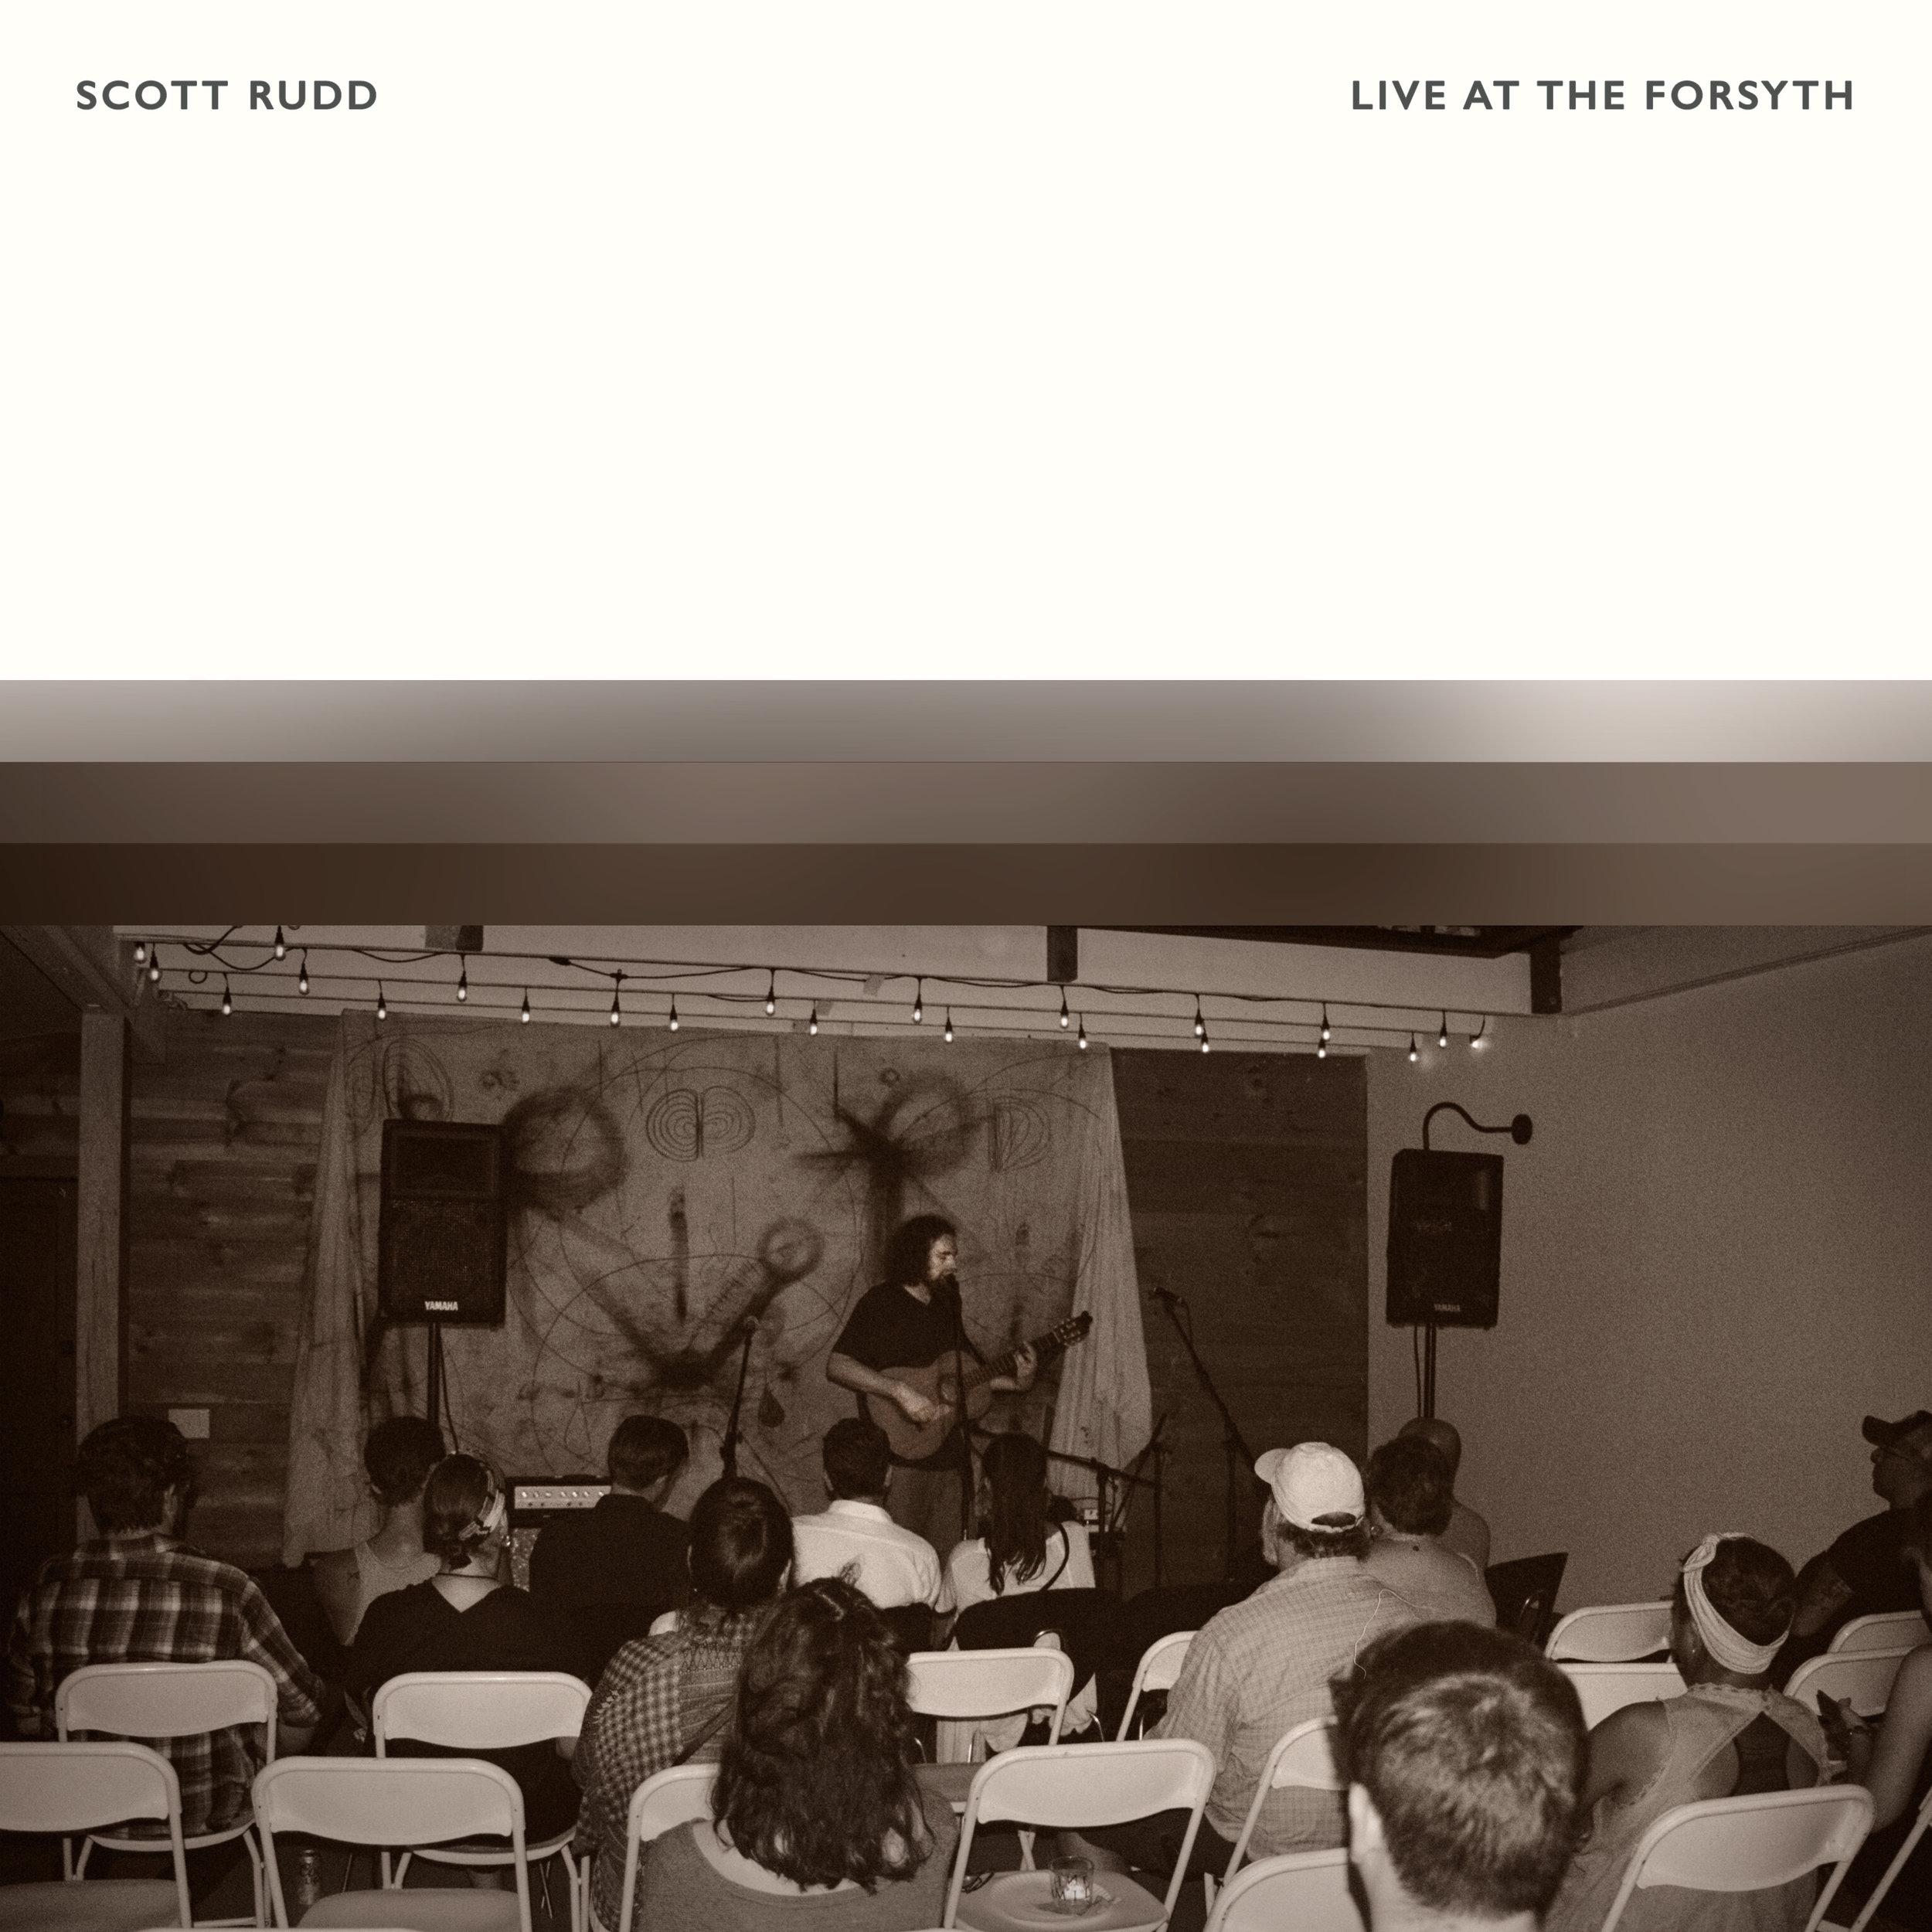 Scott Rudd - Live At The Forsyth